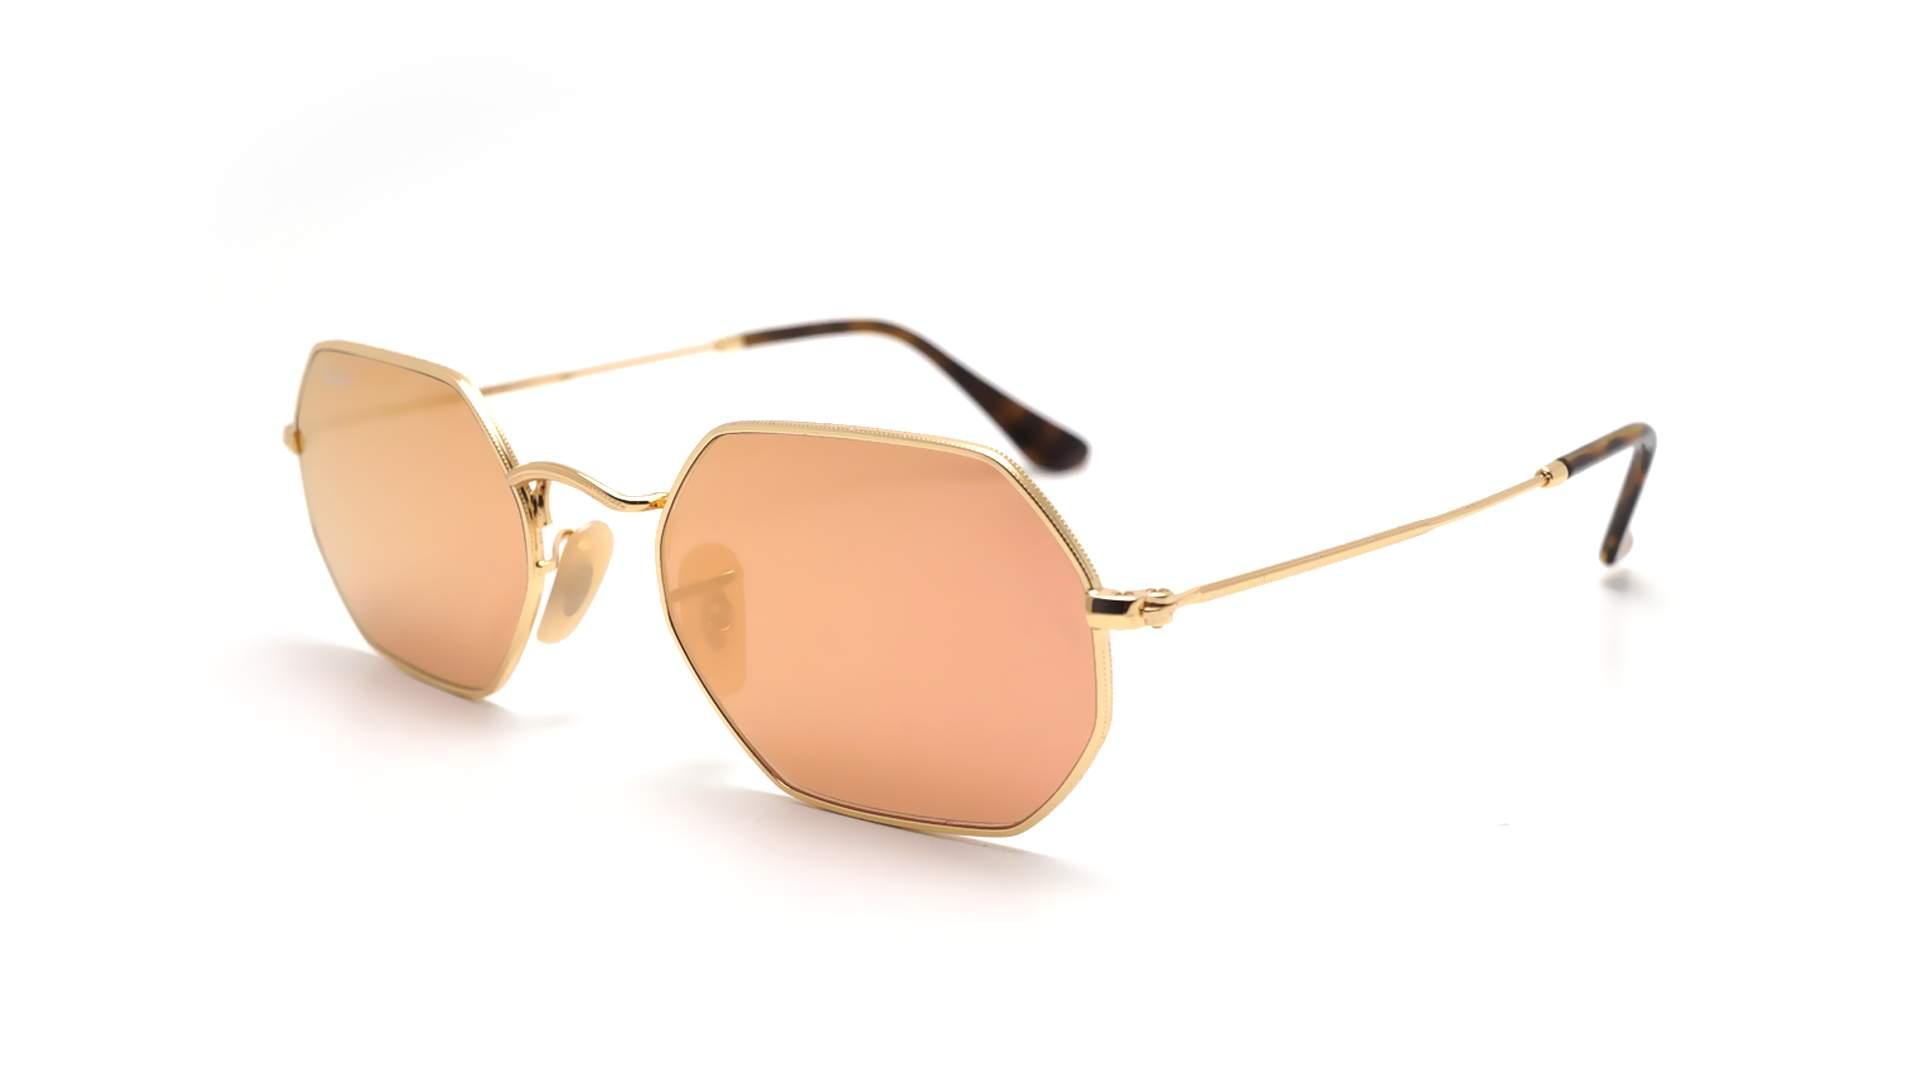 c6fb97887d Sunglasses Ray-Ban Octagonal Gold RB3556N 001 Z2 53-21 Medium Mirror